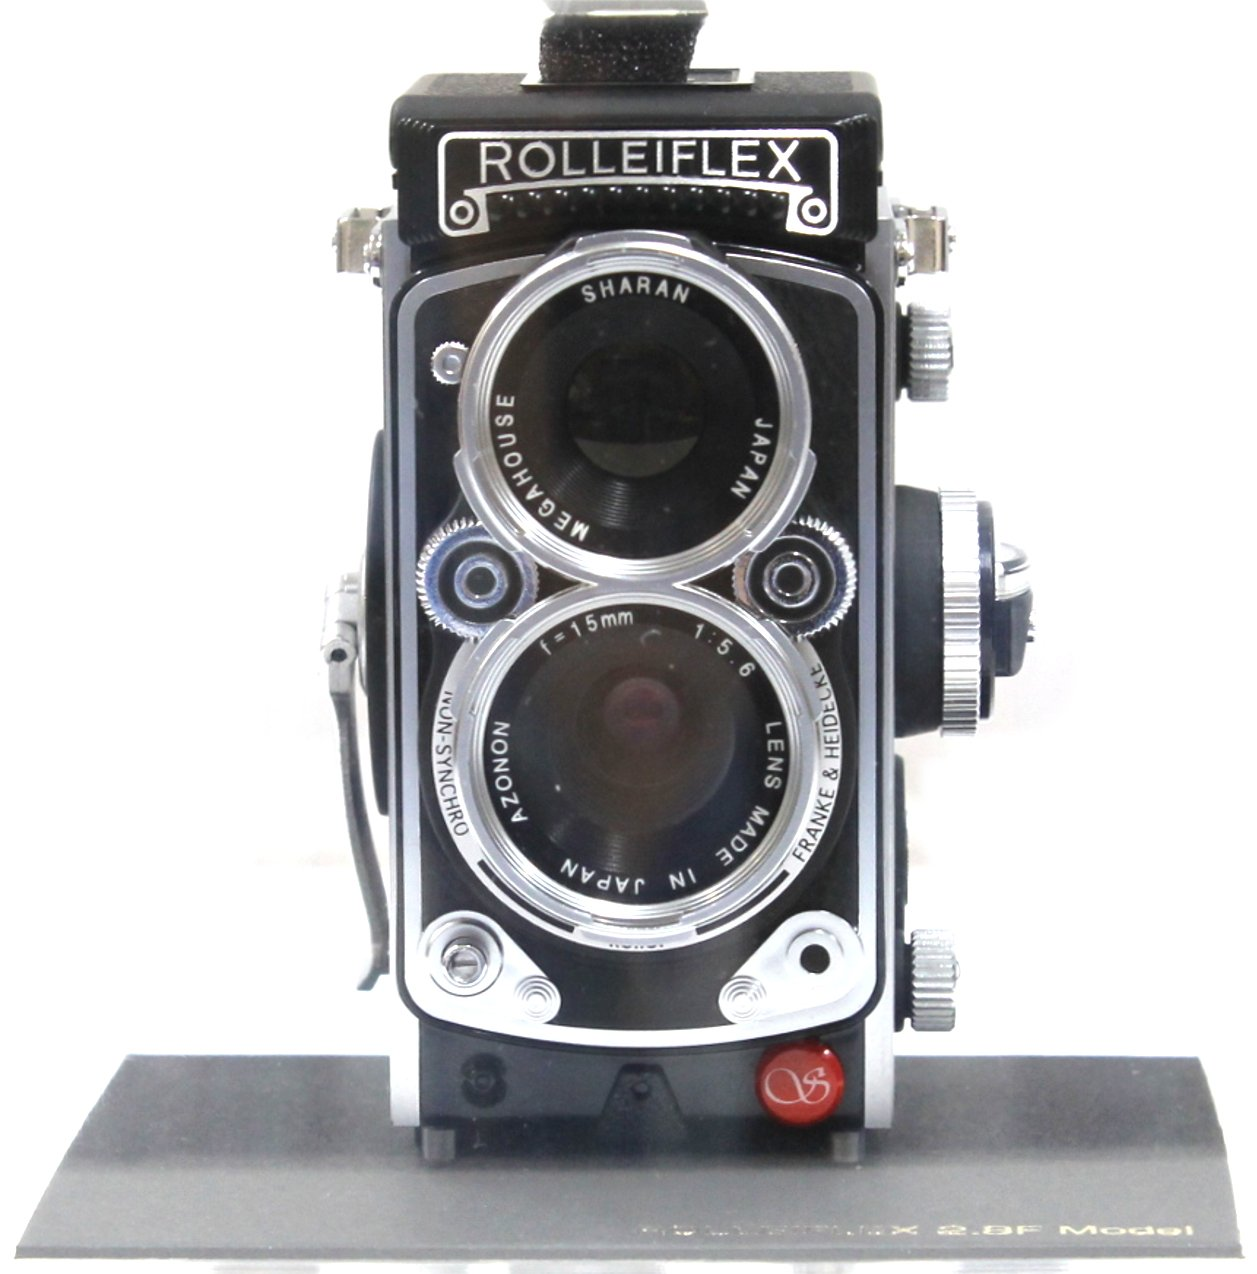 SHARAN ローライフレックス 2.8F モデル   B004VHU1WA